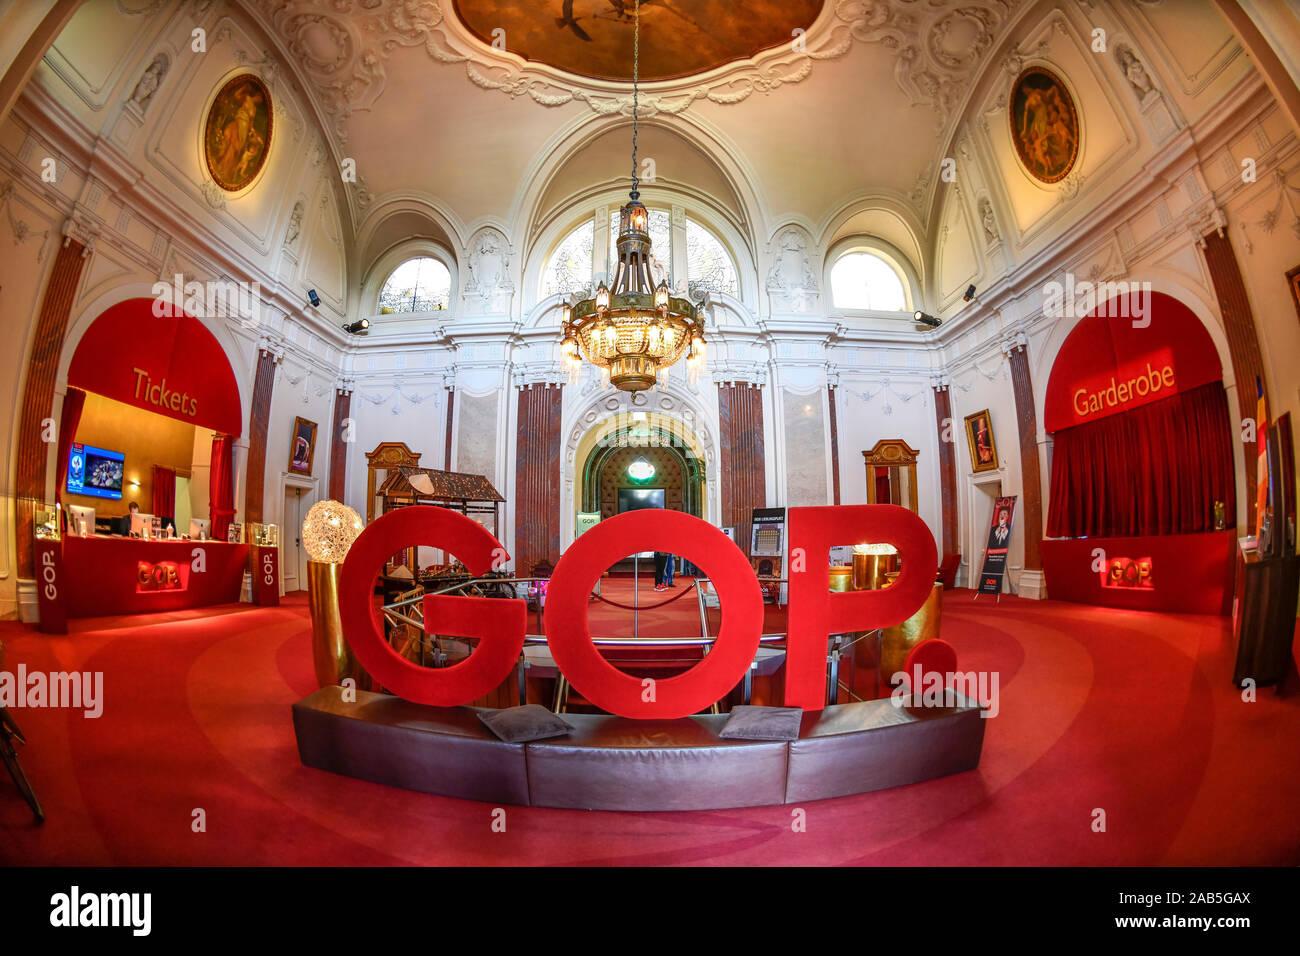 GOP Theater, Kaiserpalais, Kurpark, Bad Oeynhausen, Nordrhein-Westfalen, Deutschland Stock Photo